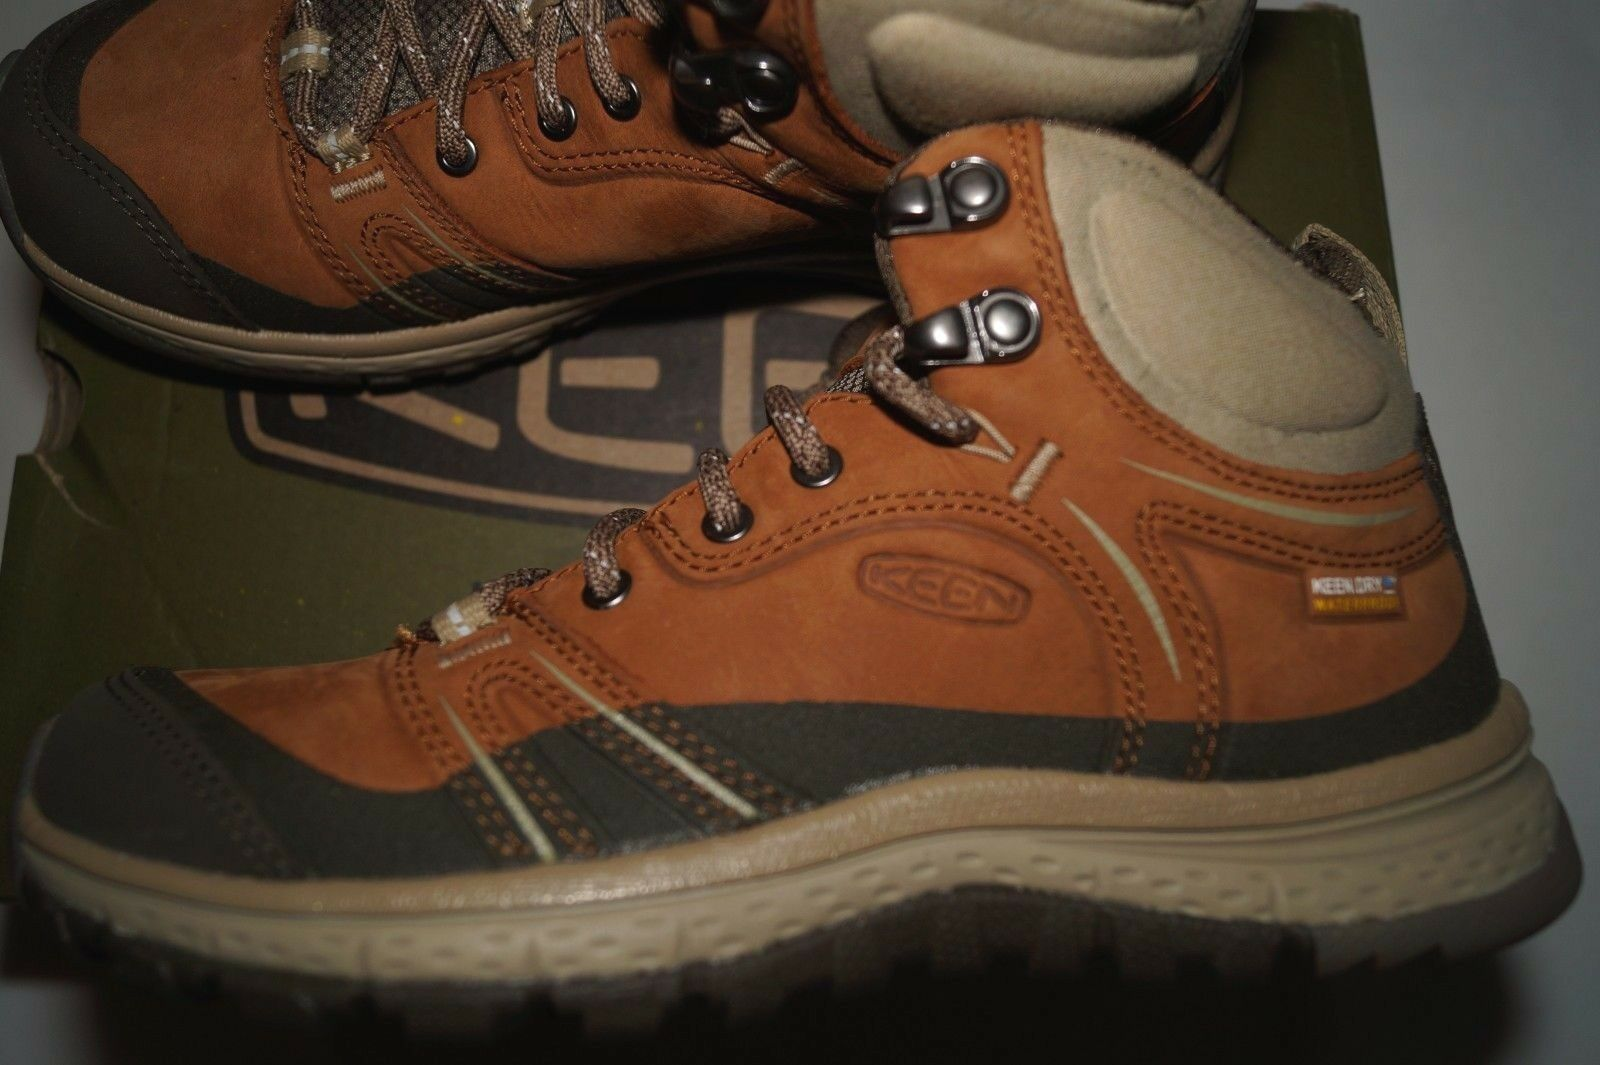 KEEN Women's Terradora Leather Mid Wp-w Hiking shoes Timber Cornstalk, 5.5 (M)